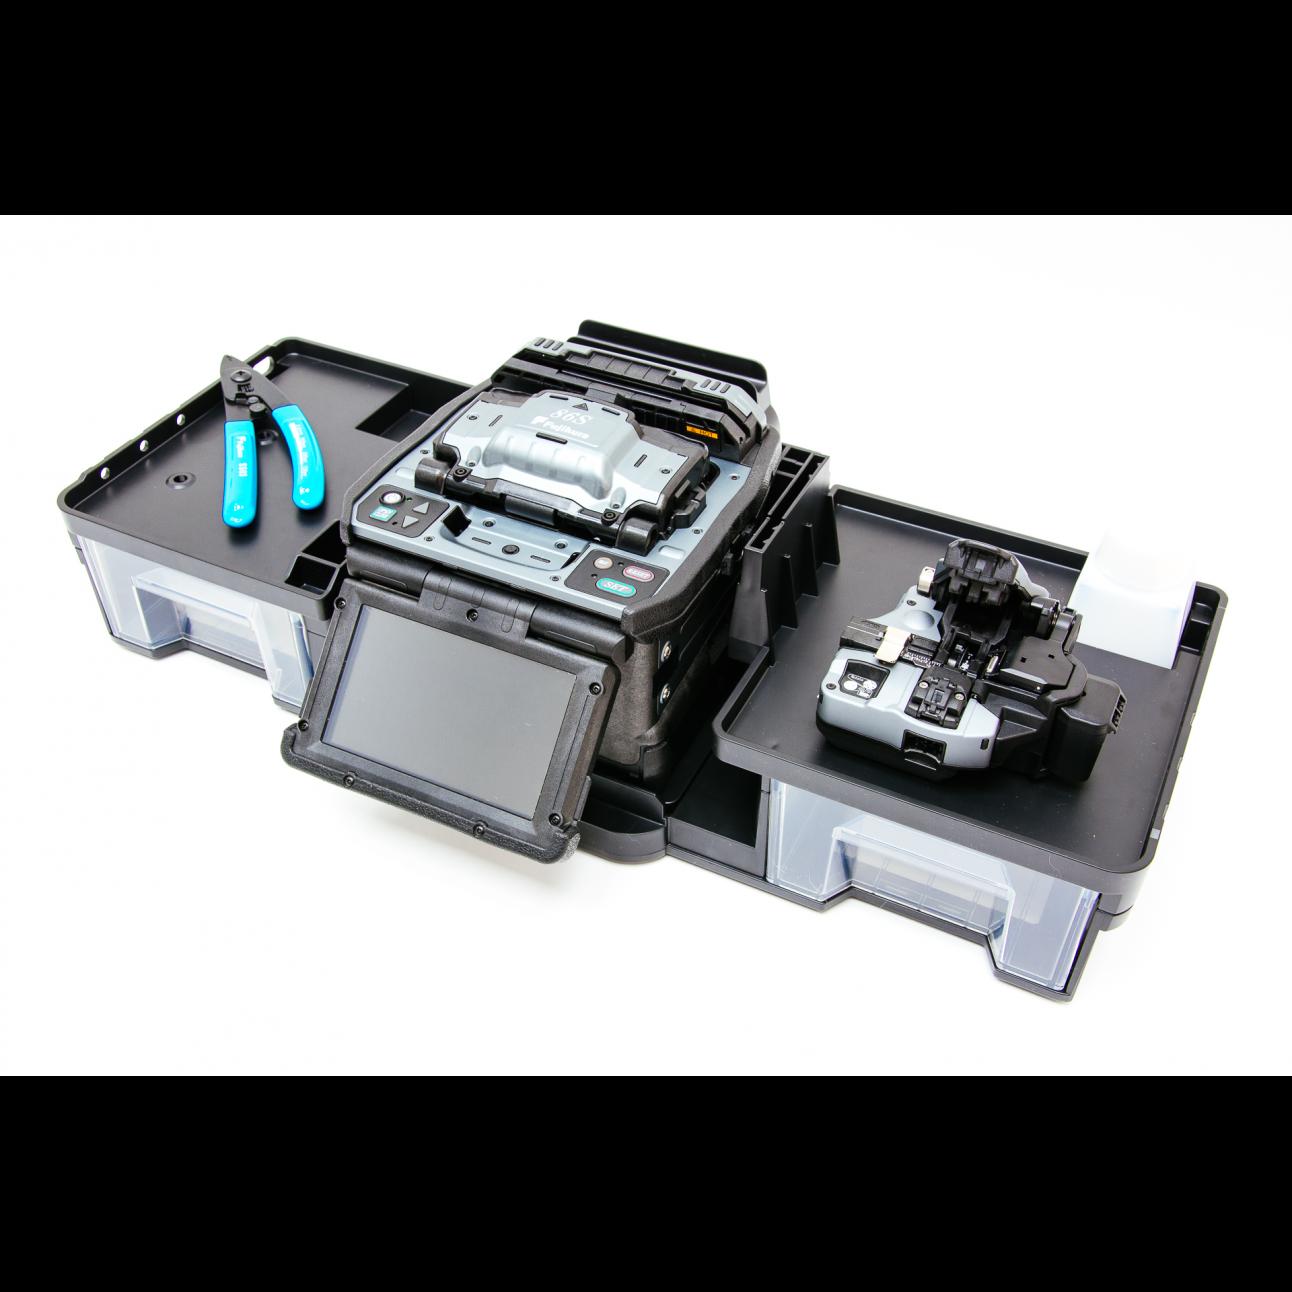 Сварочный аппарат Fujikura FSM-86S, KIT A